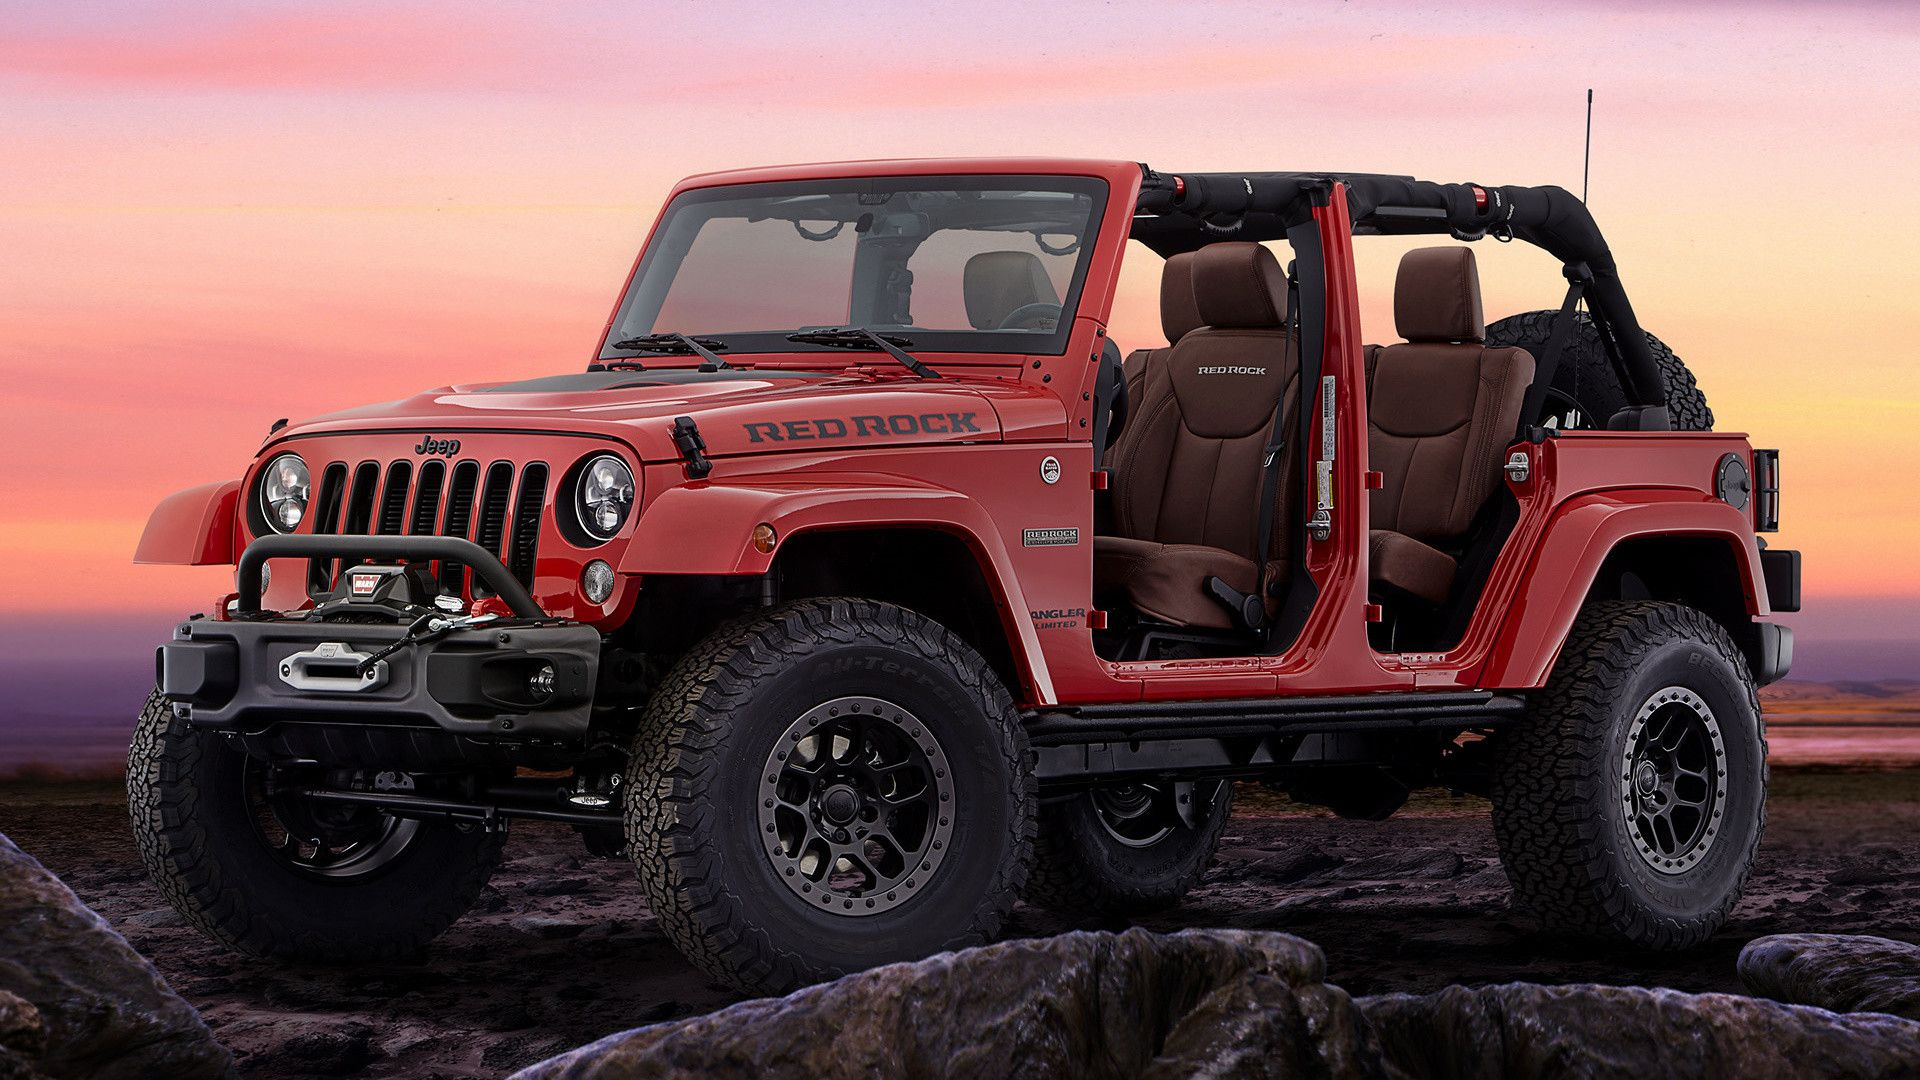 Jeep Wallpaper Hd 2015 Jeep Wrangler Red Jeep Jeep Wrangler Rubicon